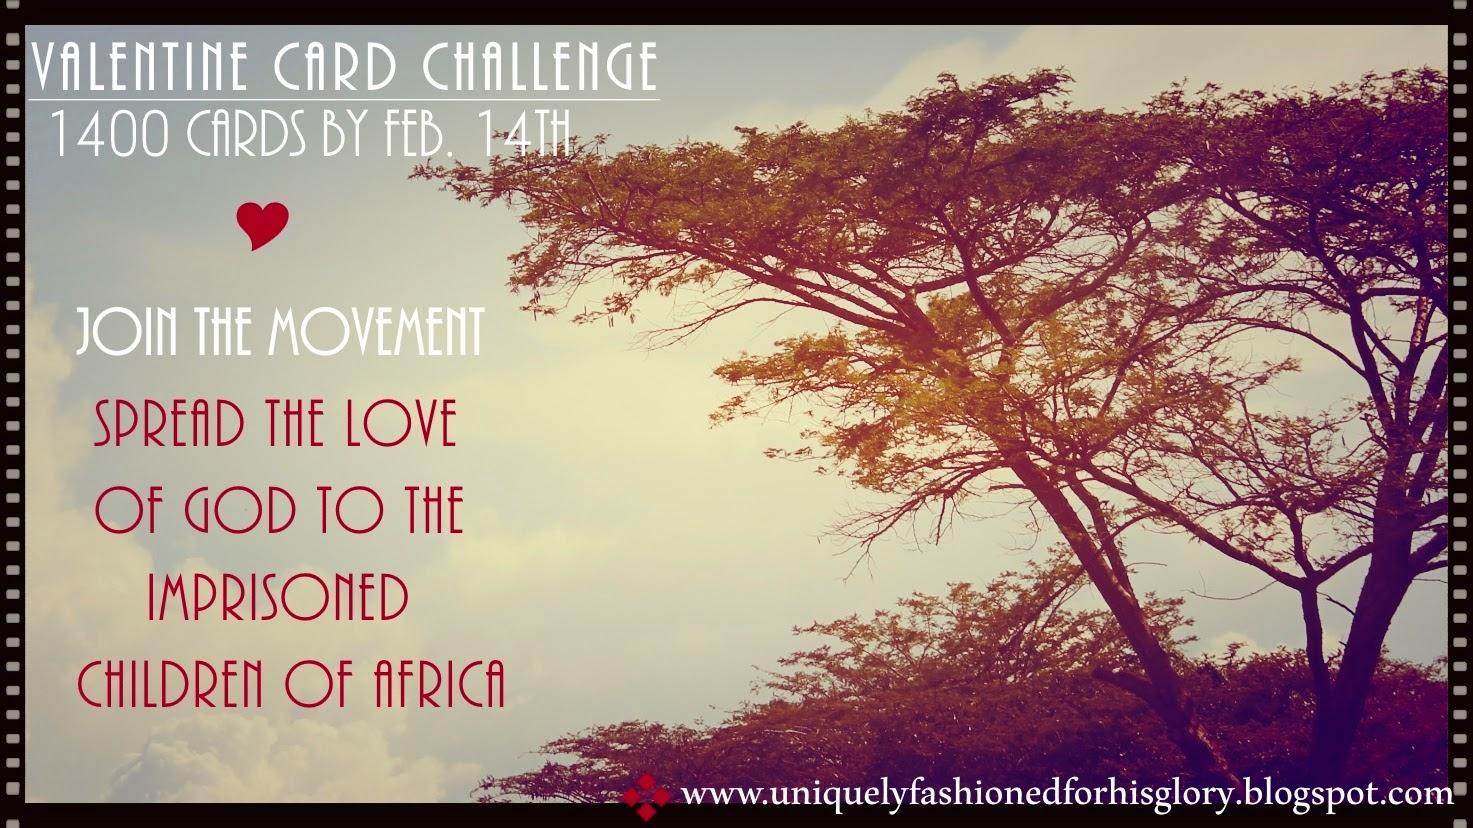 http://uniquelyfashionedforhisglory.blogspot.com/2015/01/valentine-card-challenge-1400-cards-by.html